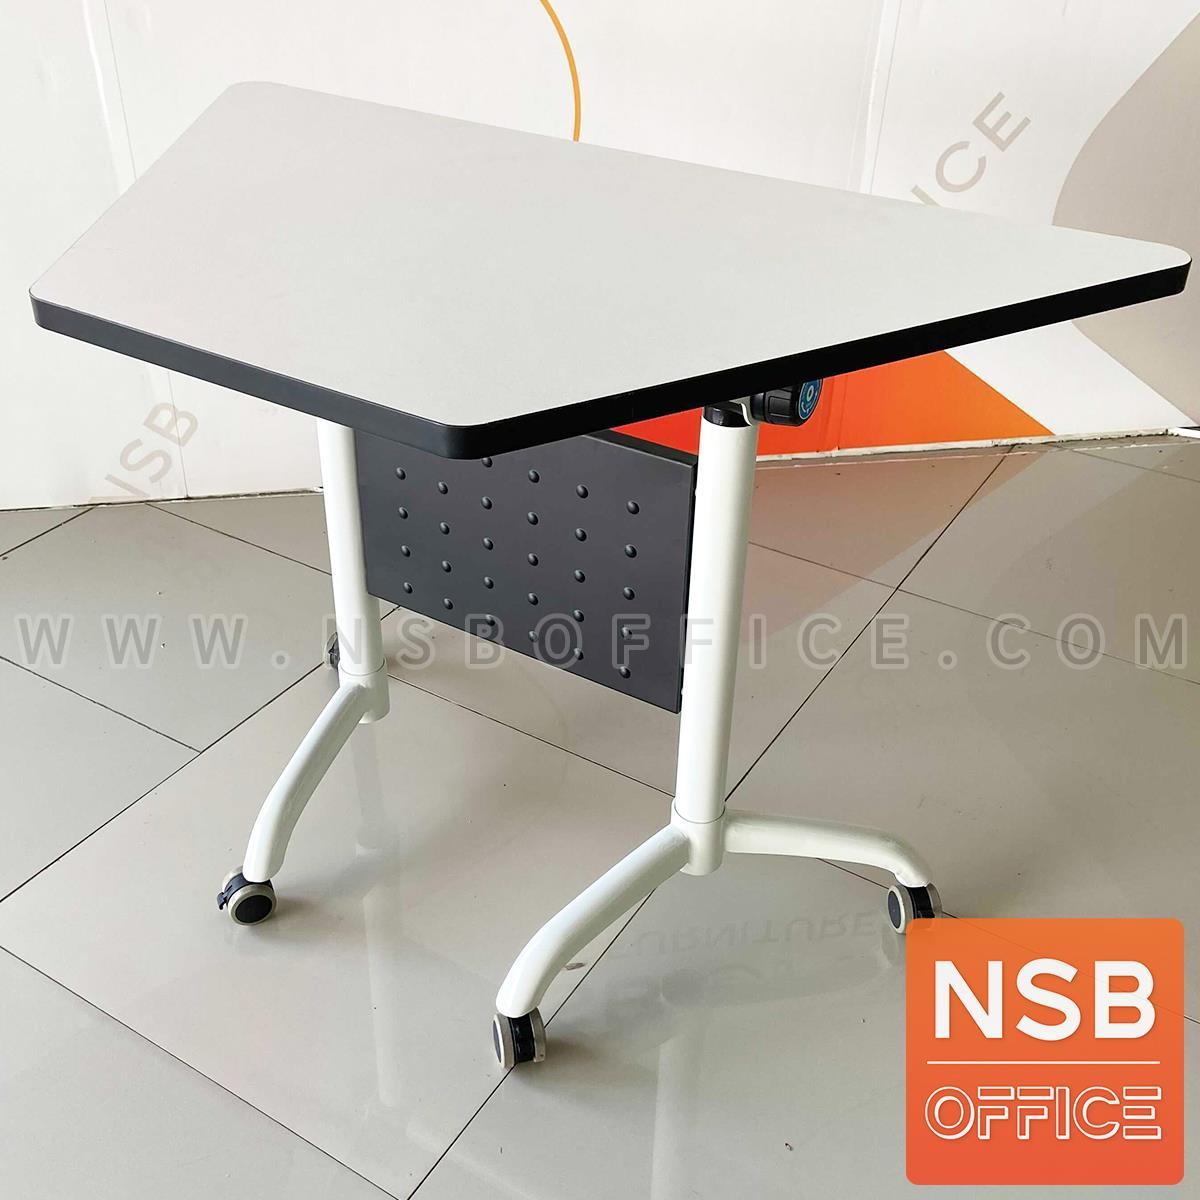 B30A064:โต๊ะพับล้อเลื่อน รุ่น Whitechic (ไวท์ชิค)  ขาเหล็กพ่นสี